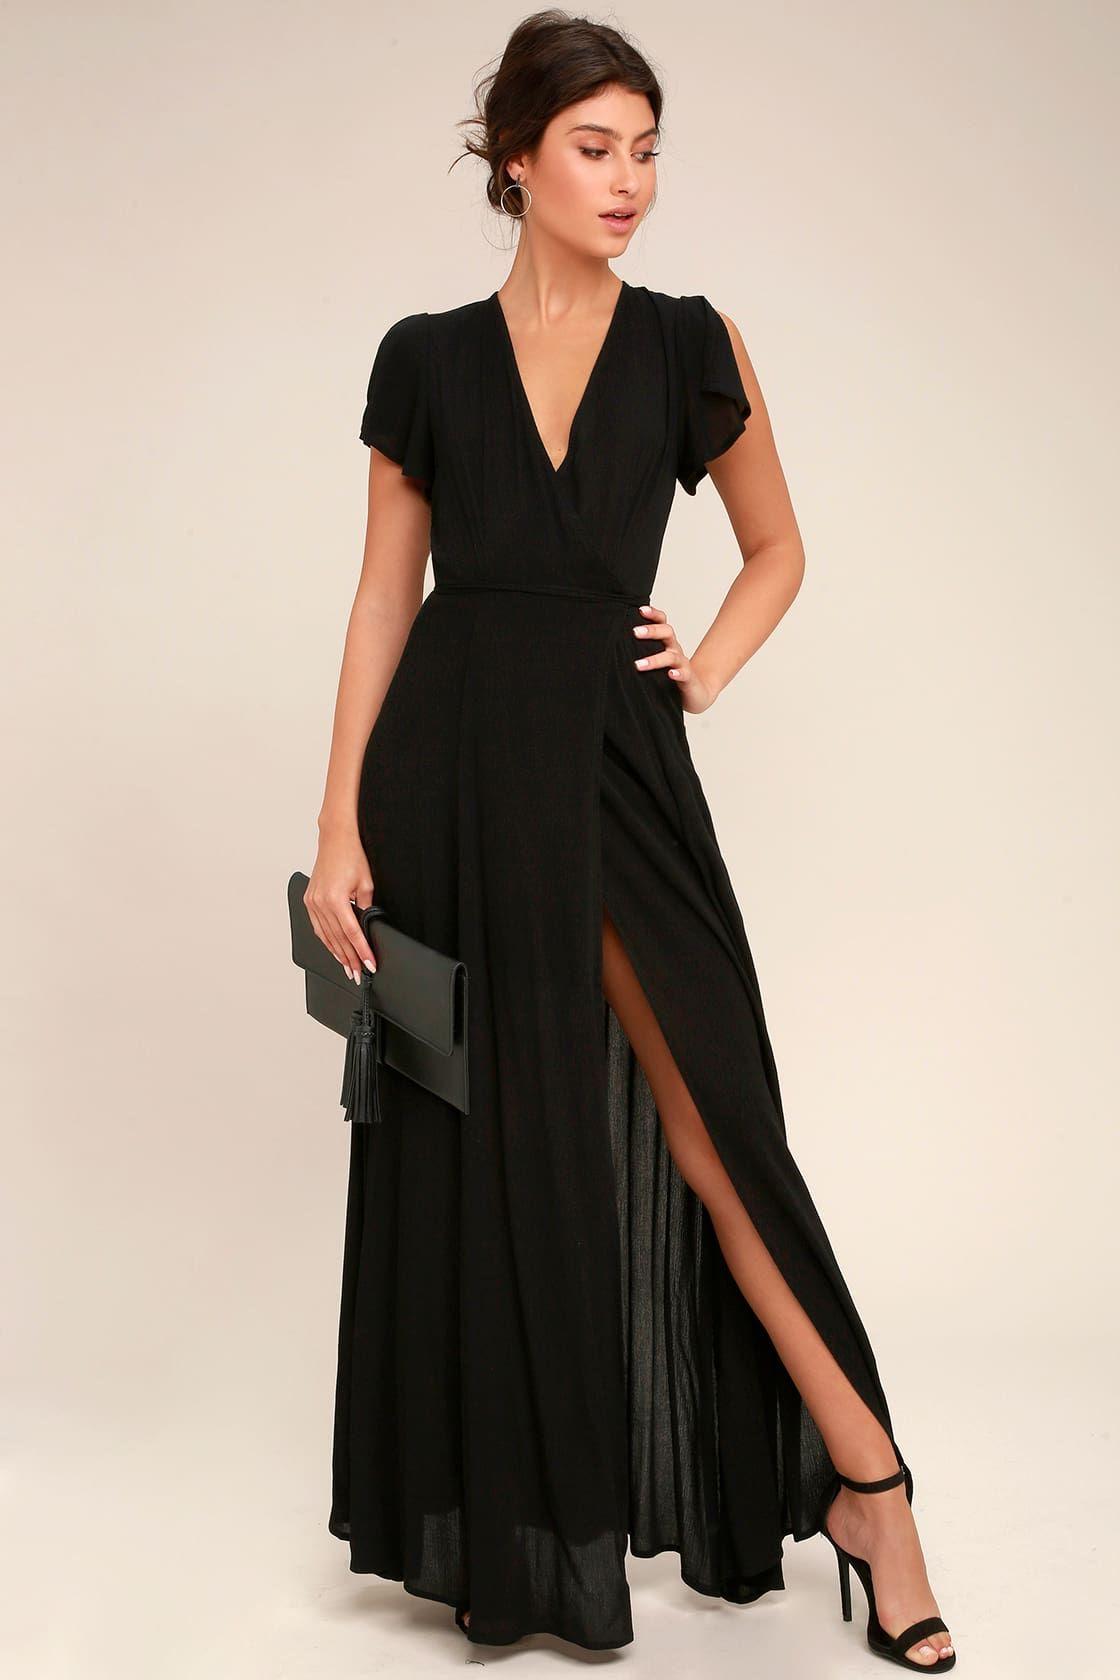 Heart Of Marigold Black Wrap Maxi Dress In 2020 Maxi Dress Maxi Wrap Dress Black Wrap Dress [ 1680 x 1120 Pixel ]